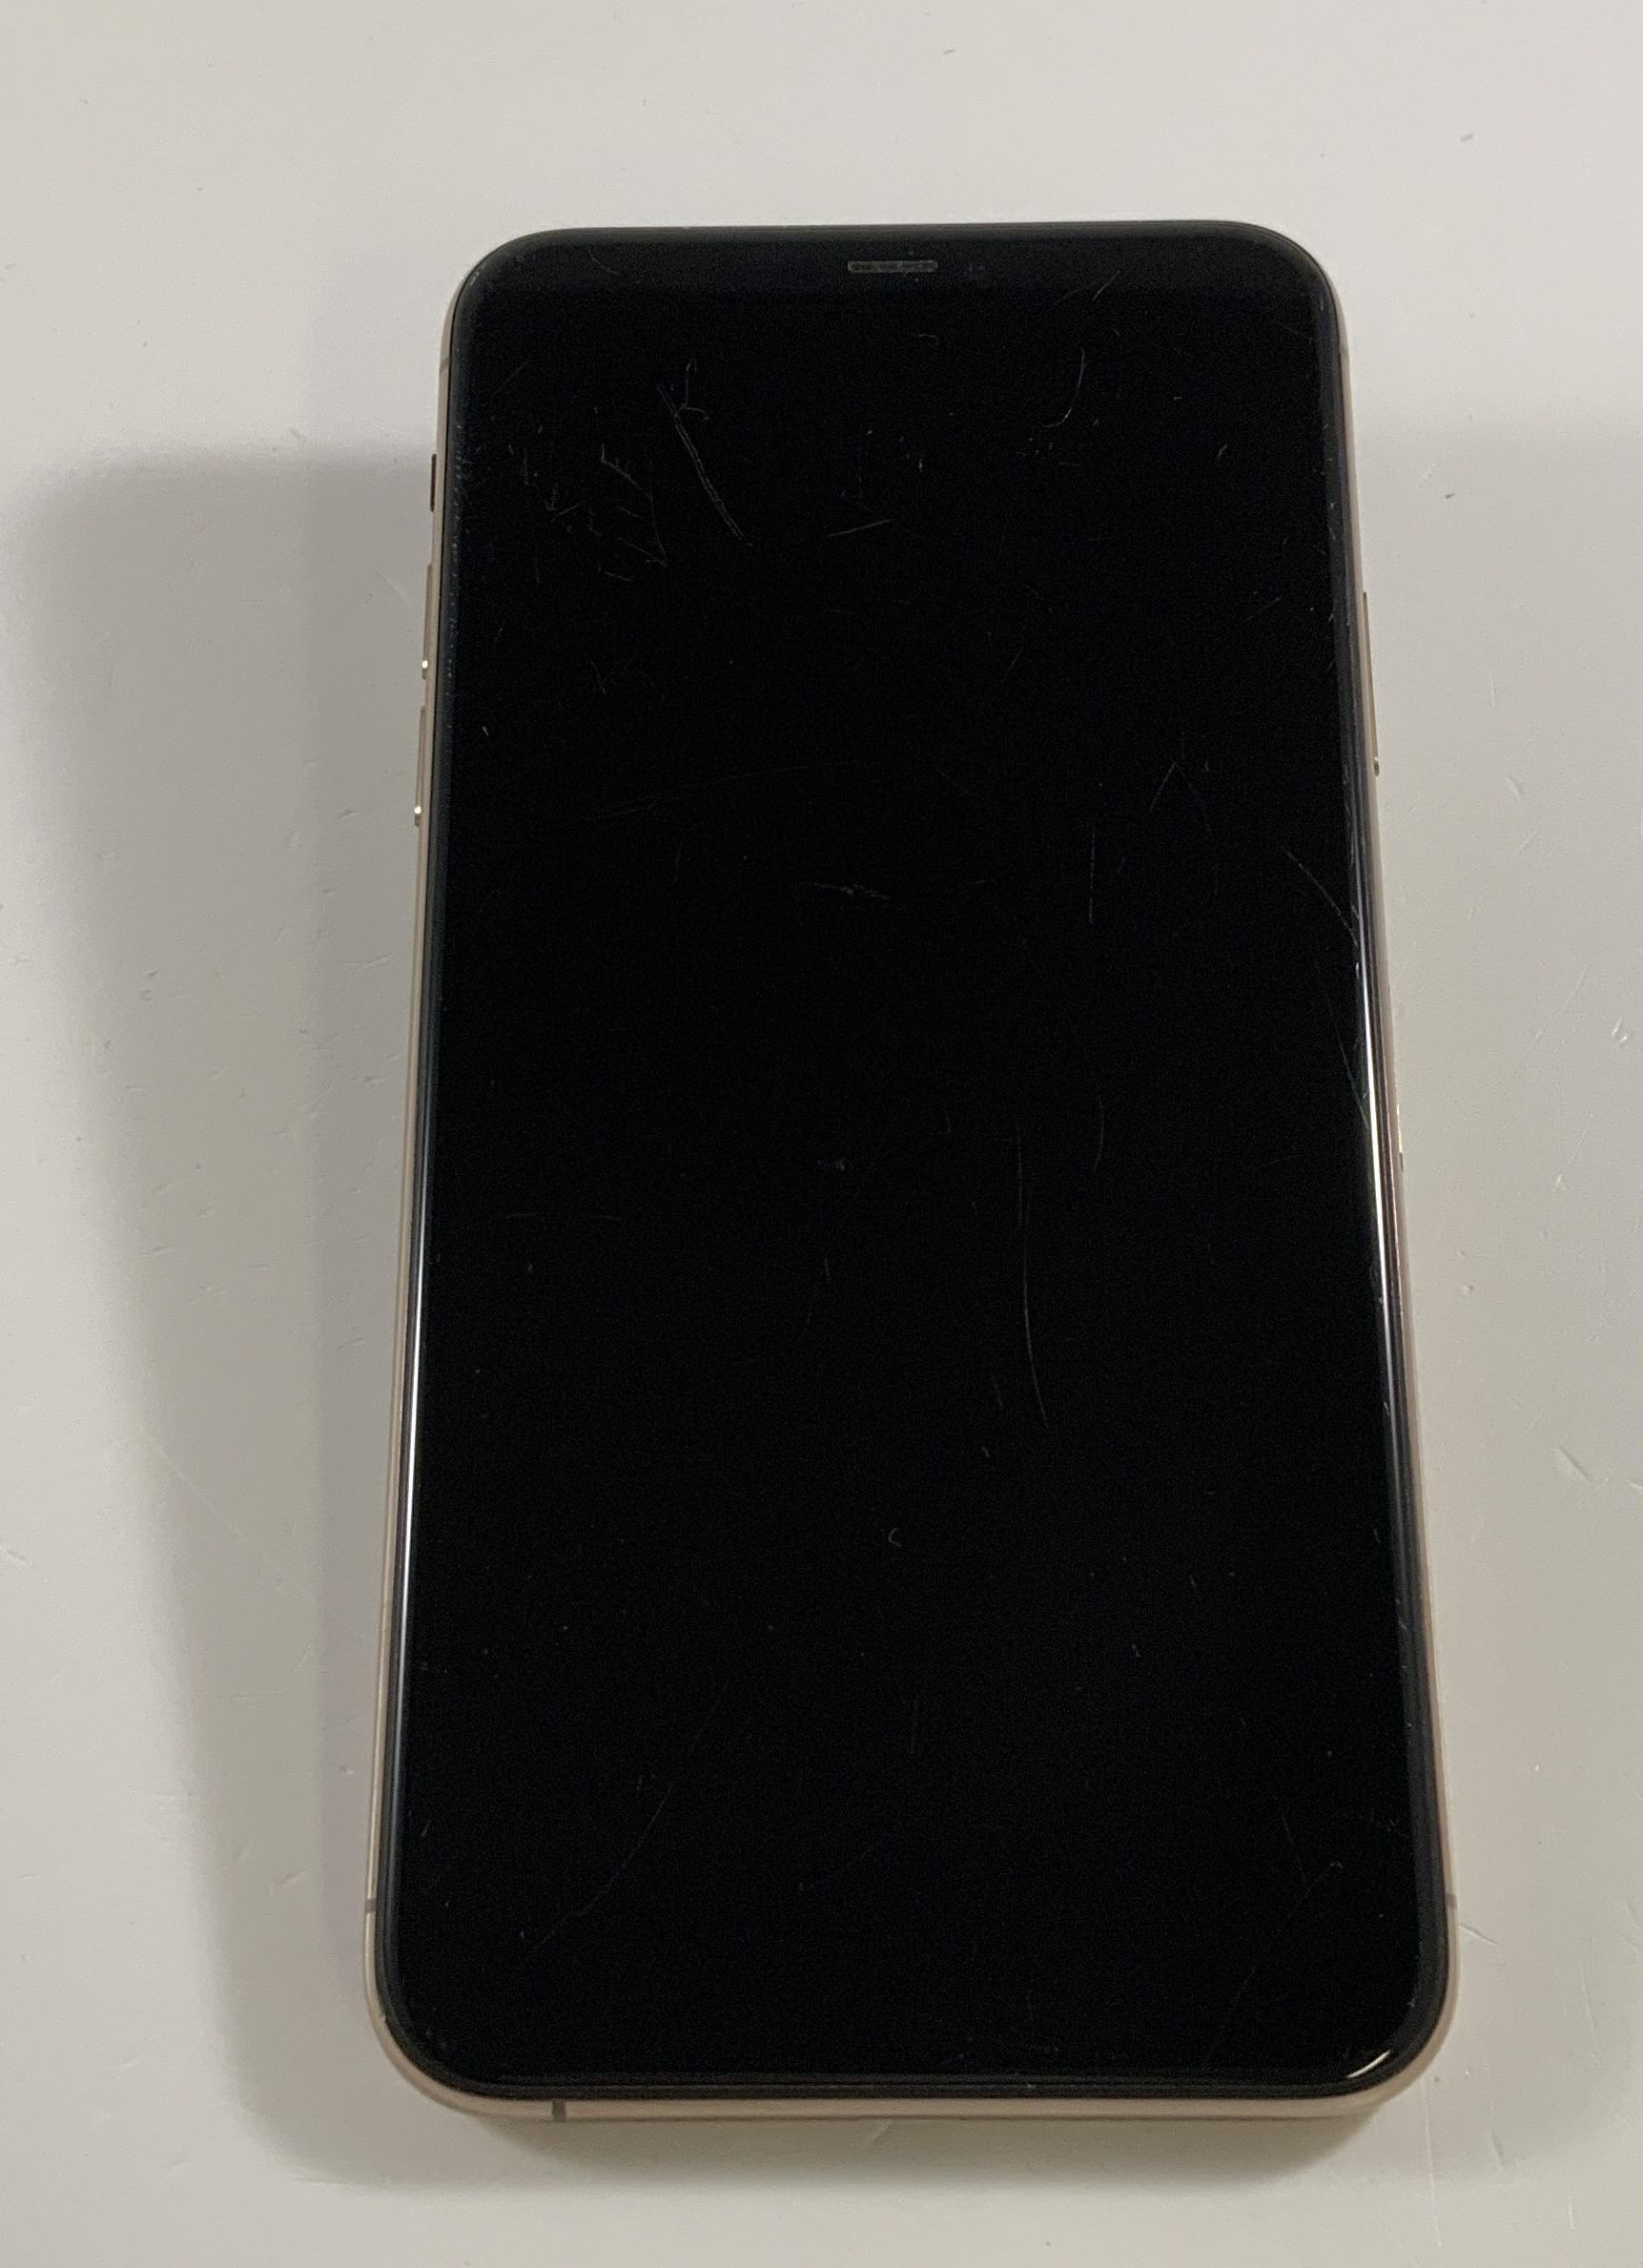 iPhone 11 Pro Max 256GB, 256GB, Gold, Bild 1